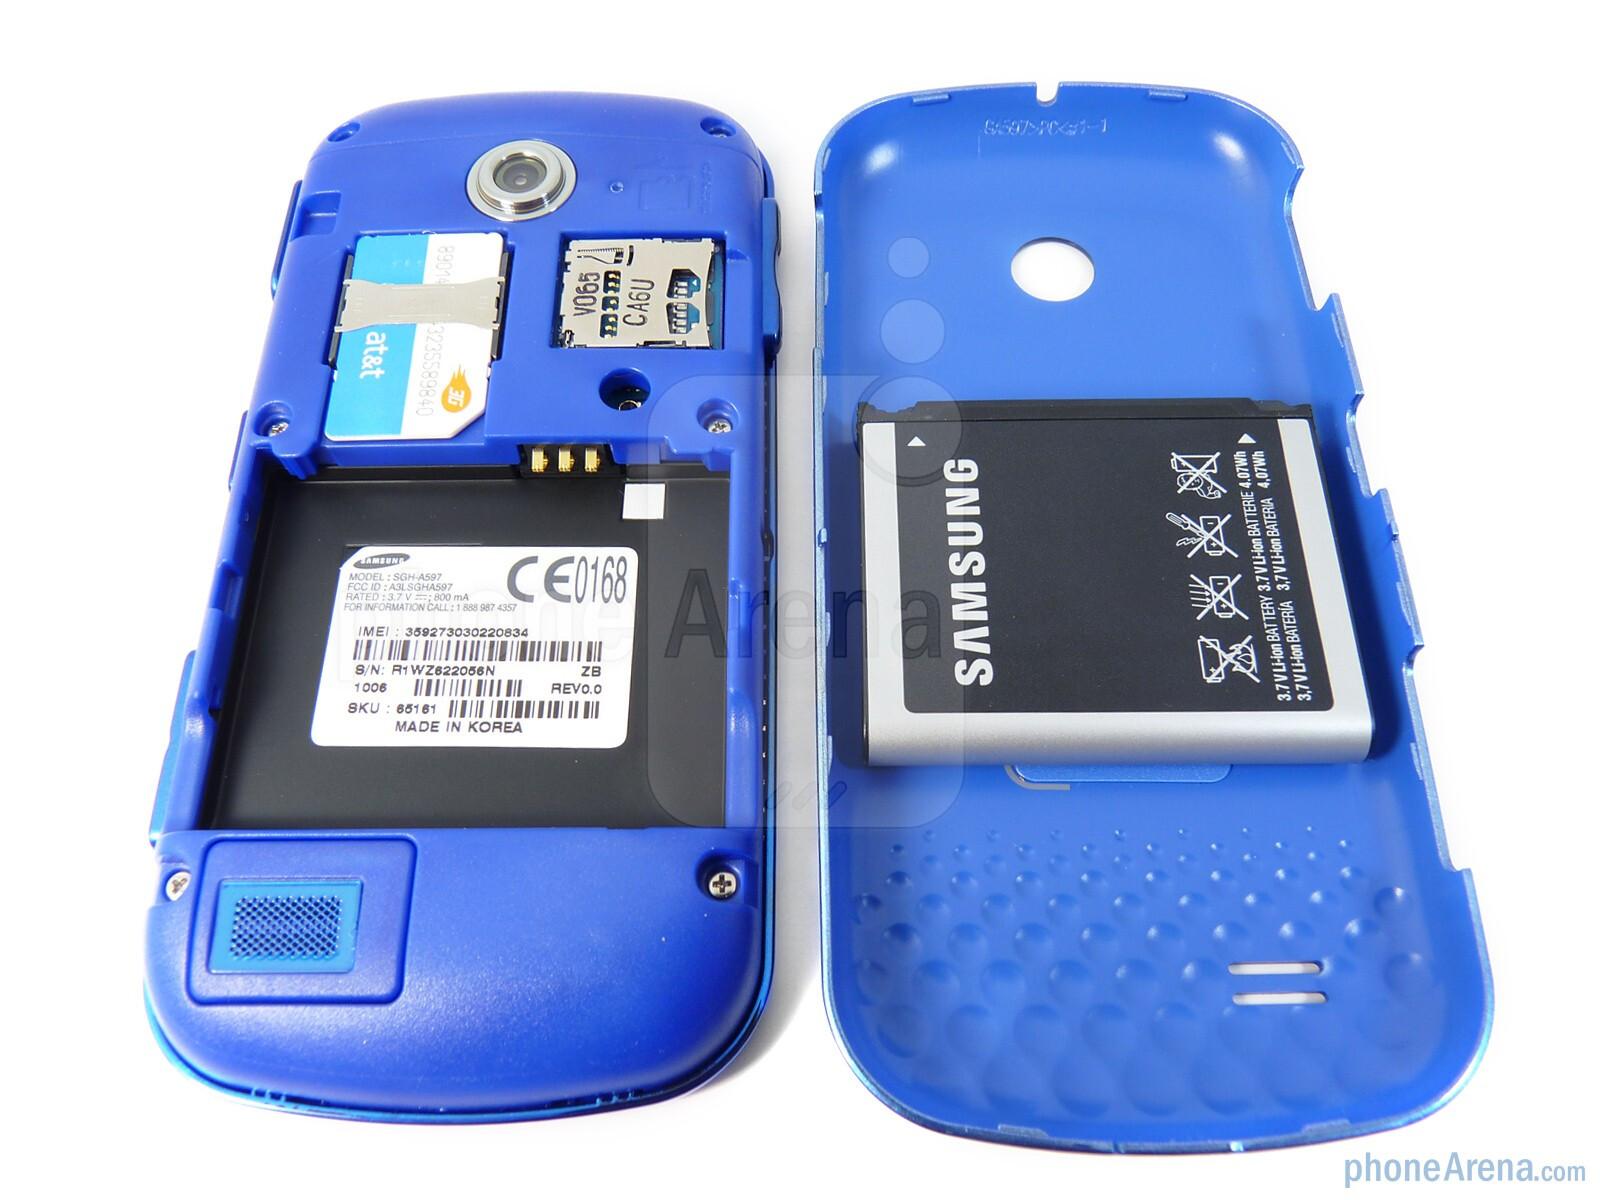 samsung eternity ii review rh phonearena com Samsung Impression A877 Samsung Galaxy S4 Diamond Cases